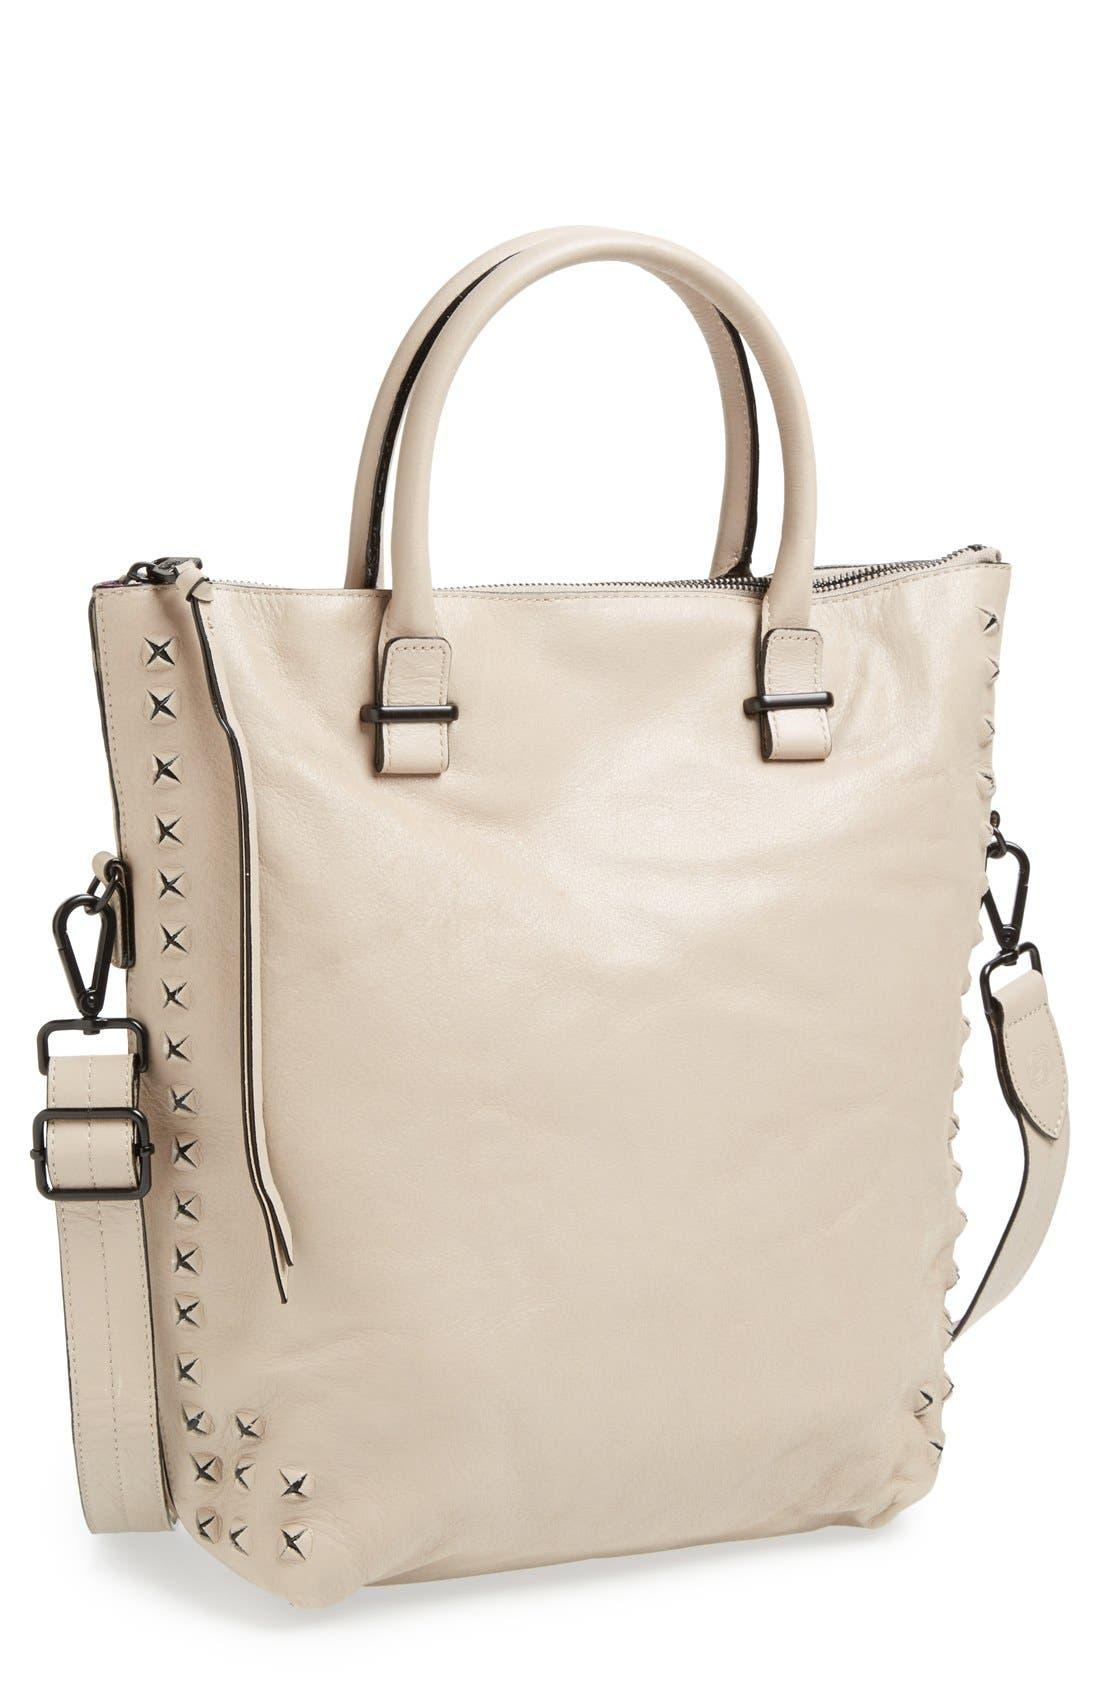 Alternate Image 1 Selected - Elliott Lucca 'Medium Maia' Leather Foldover Tote